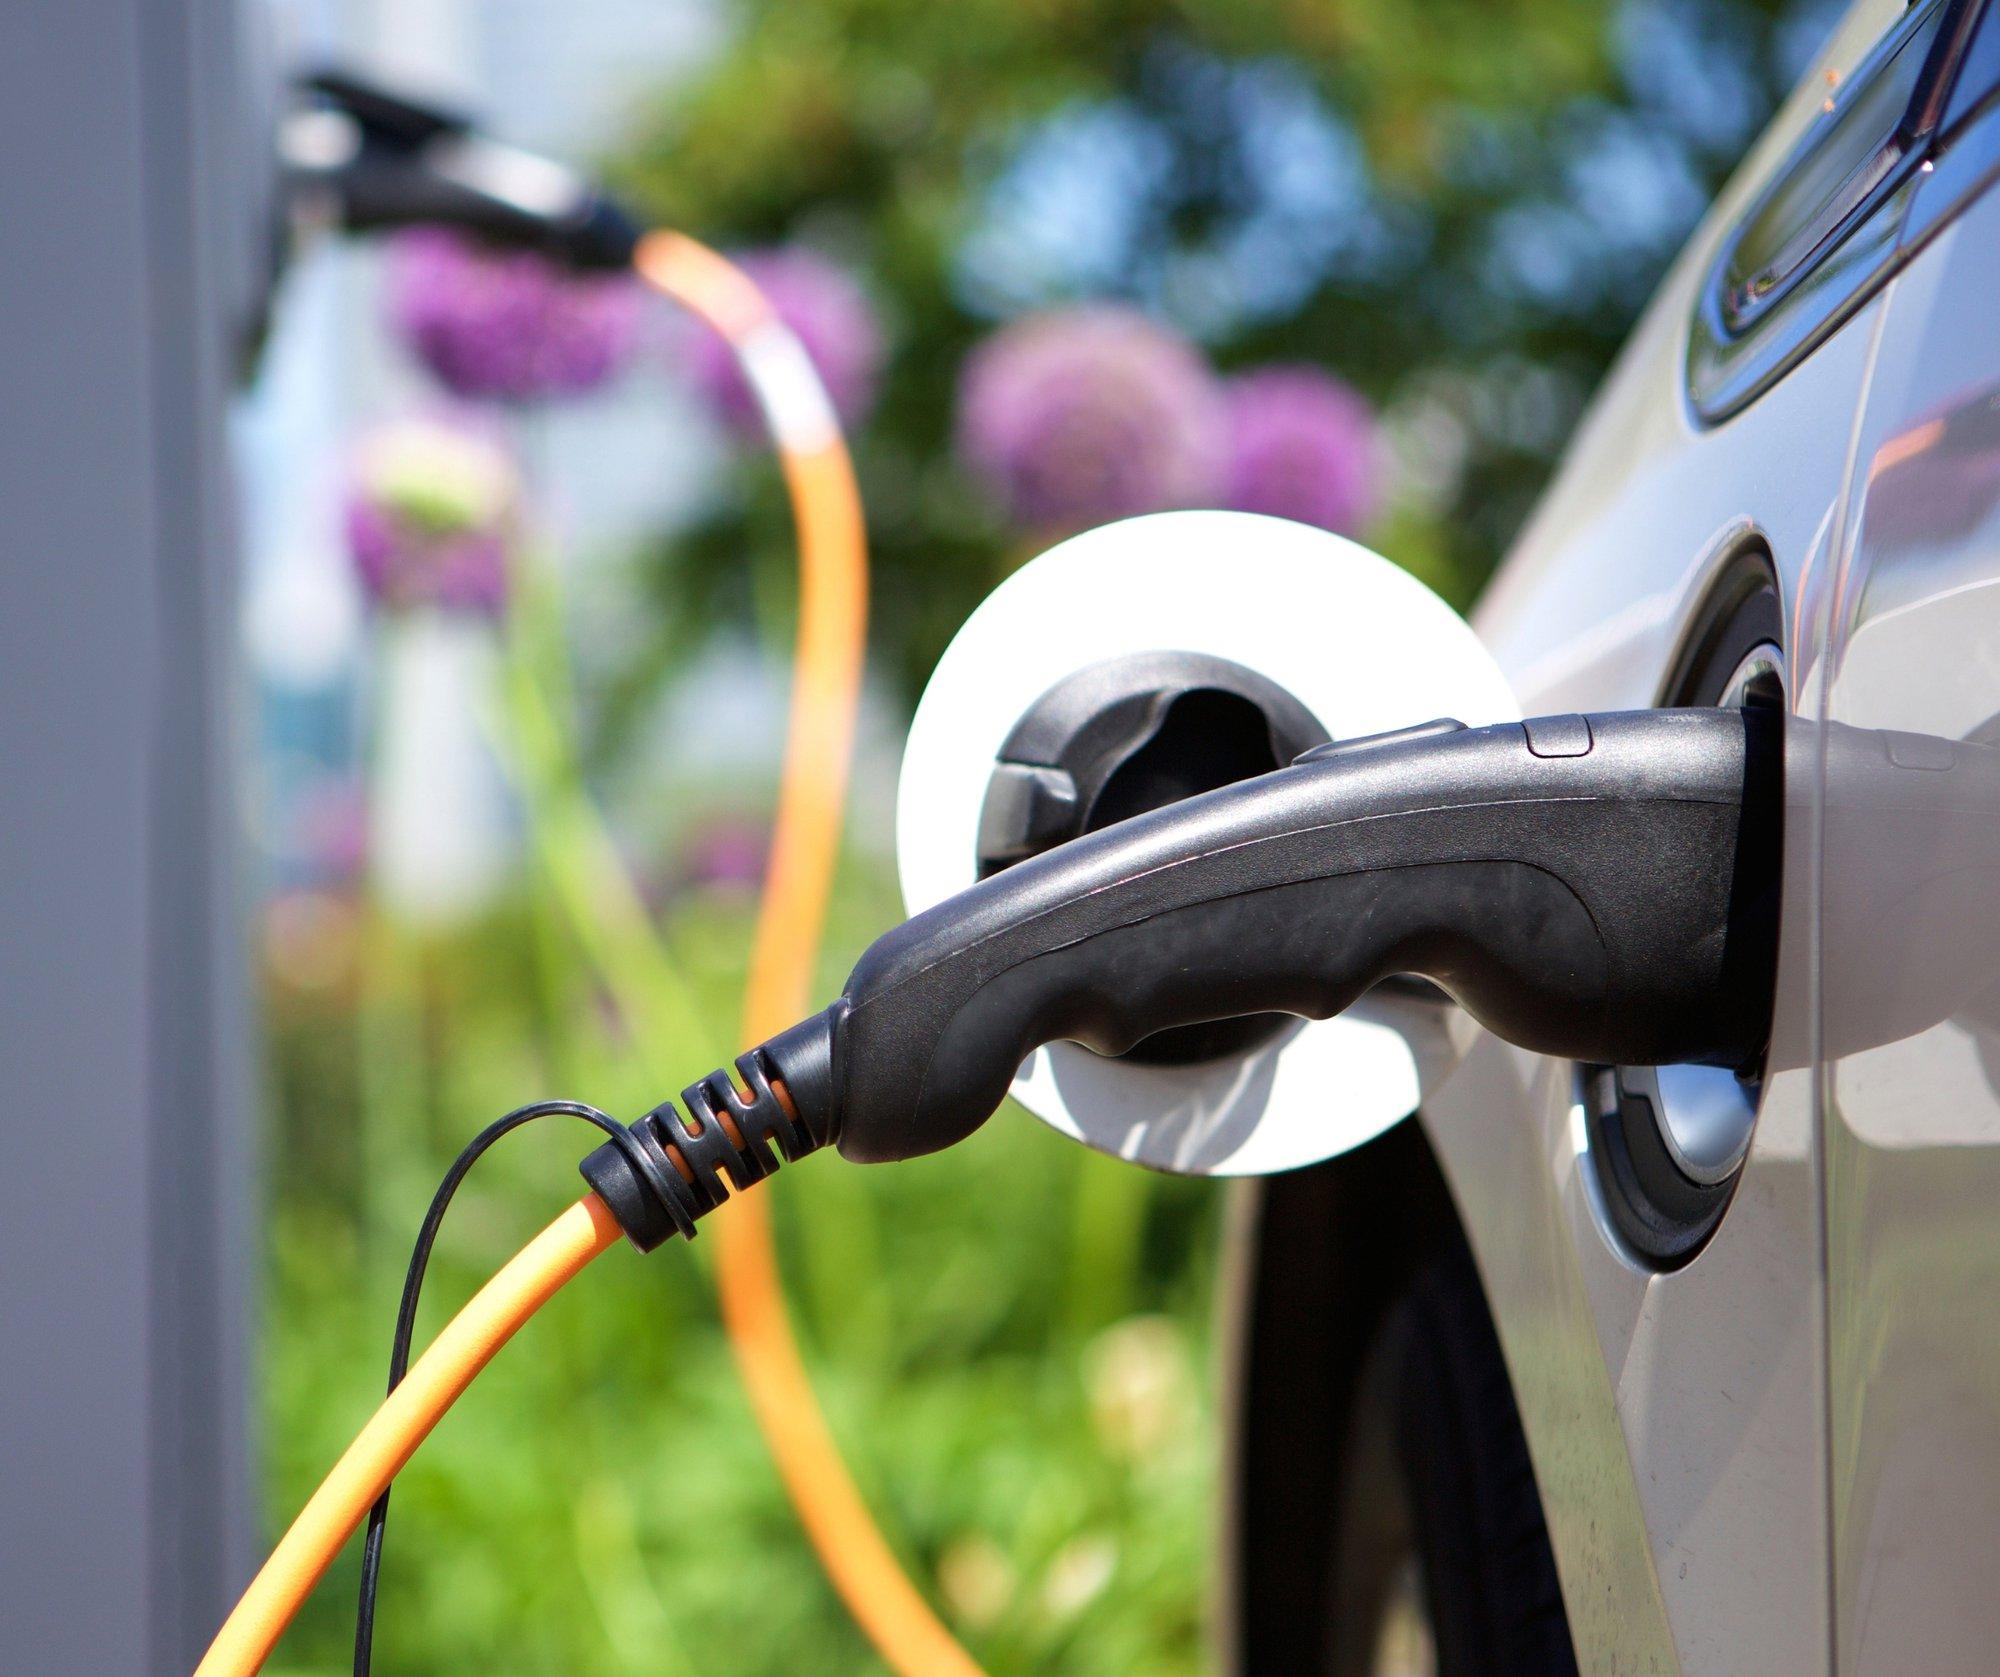 Streekintercommunales starten aankoopcentrale duurzame voertuigen